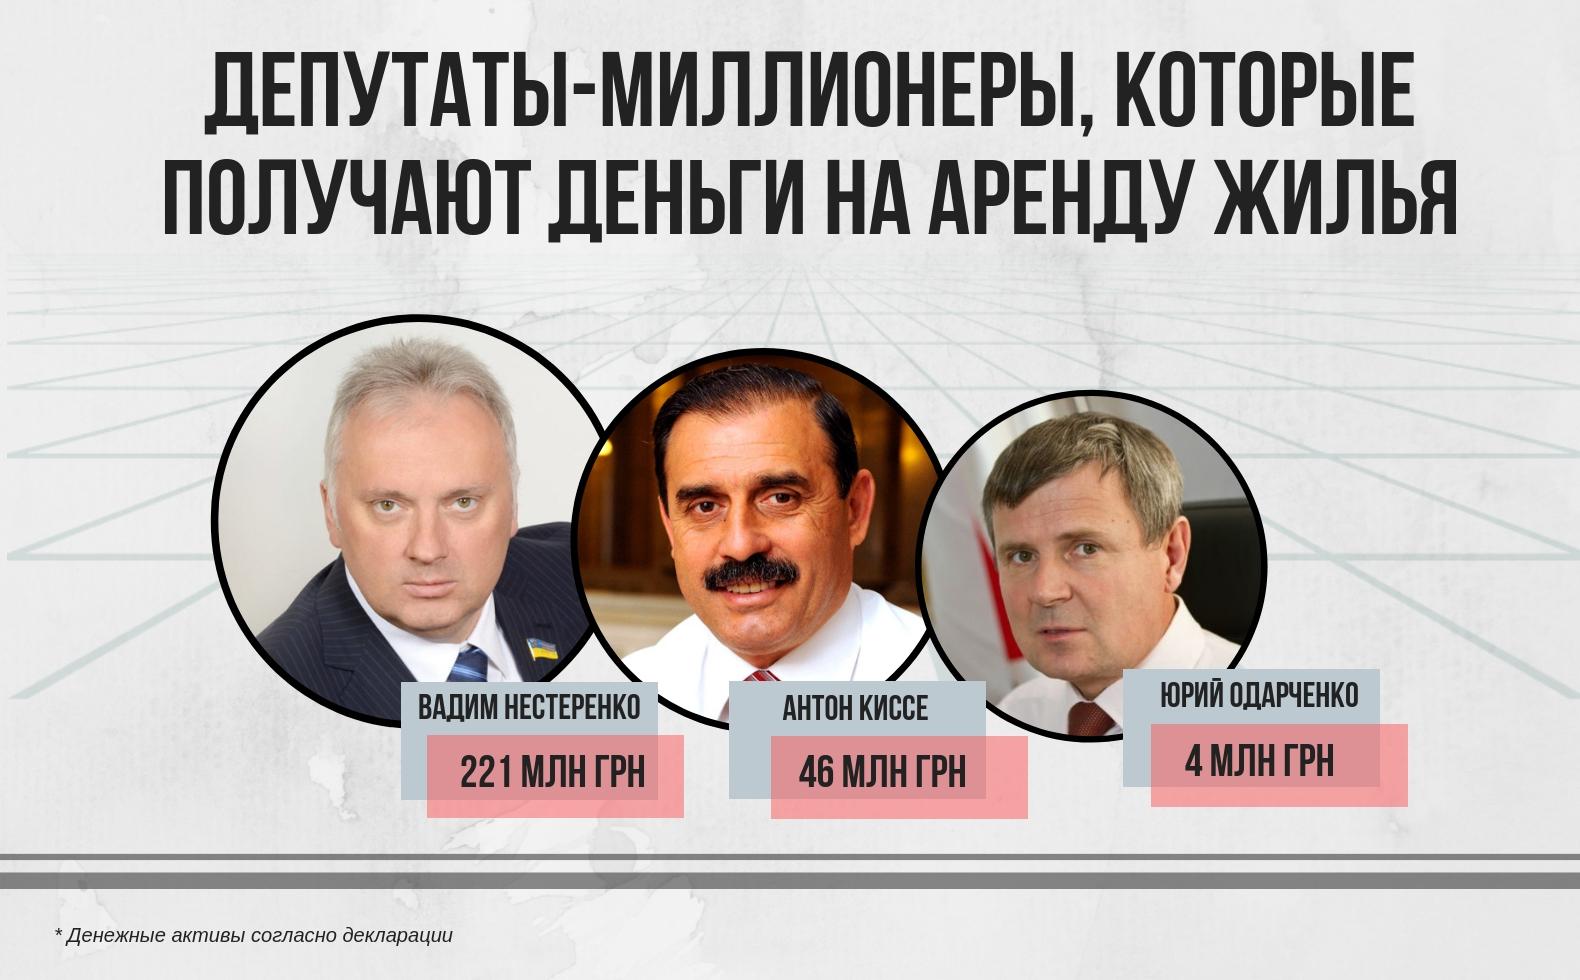 https://apostrophe.ua/uploads/21112018/37b84de9fcccec138e4e5ff9d7adda3c.jpg